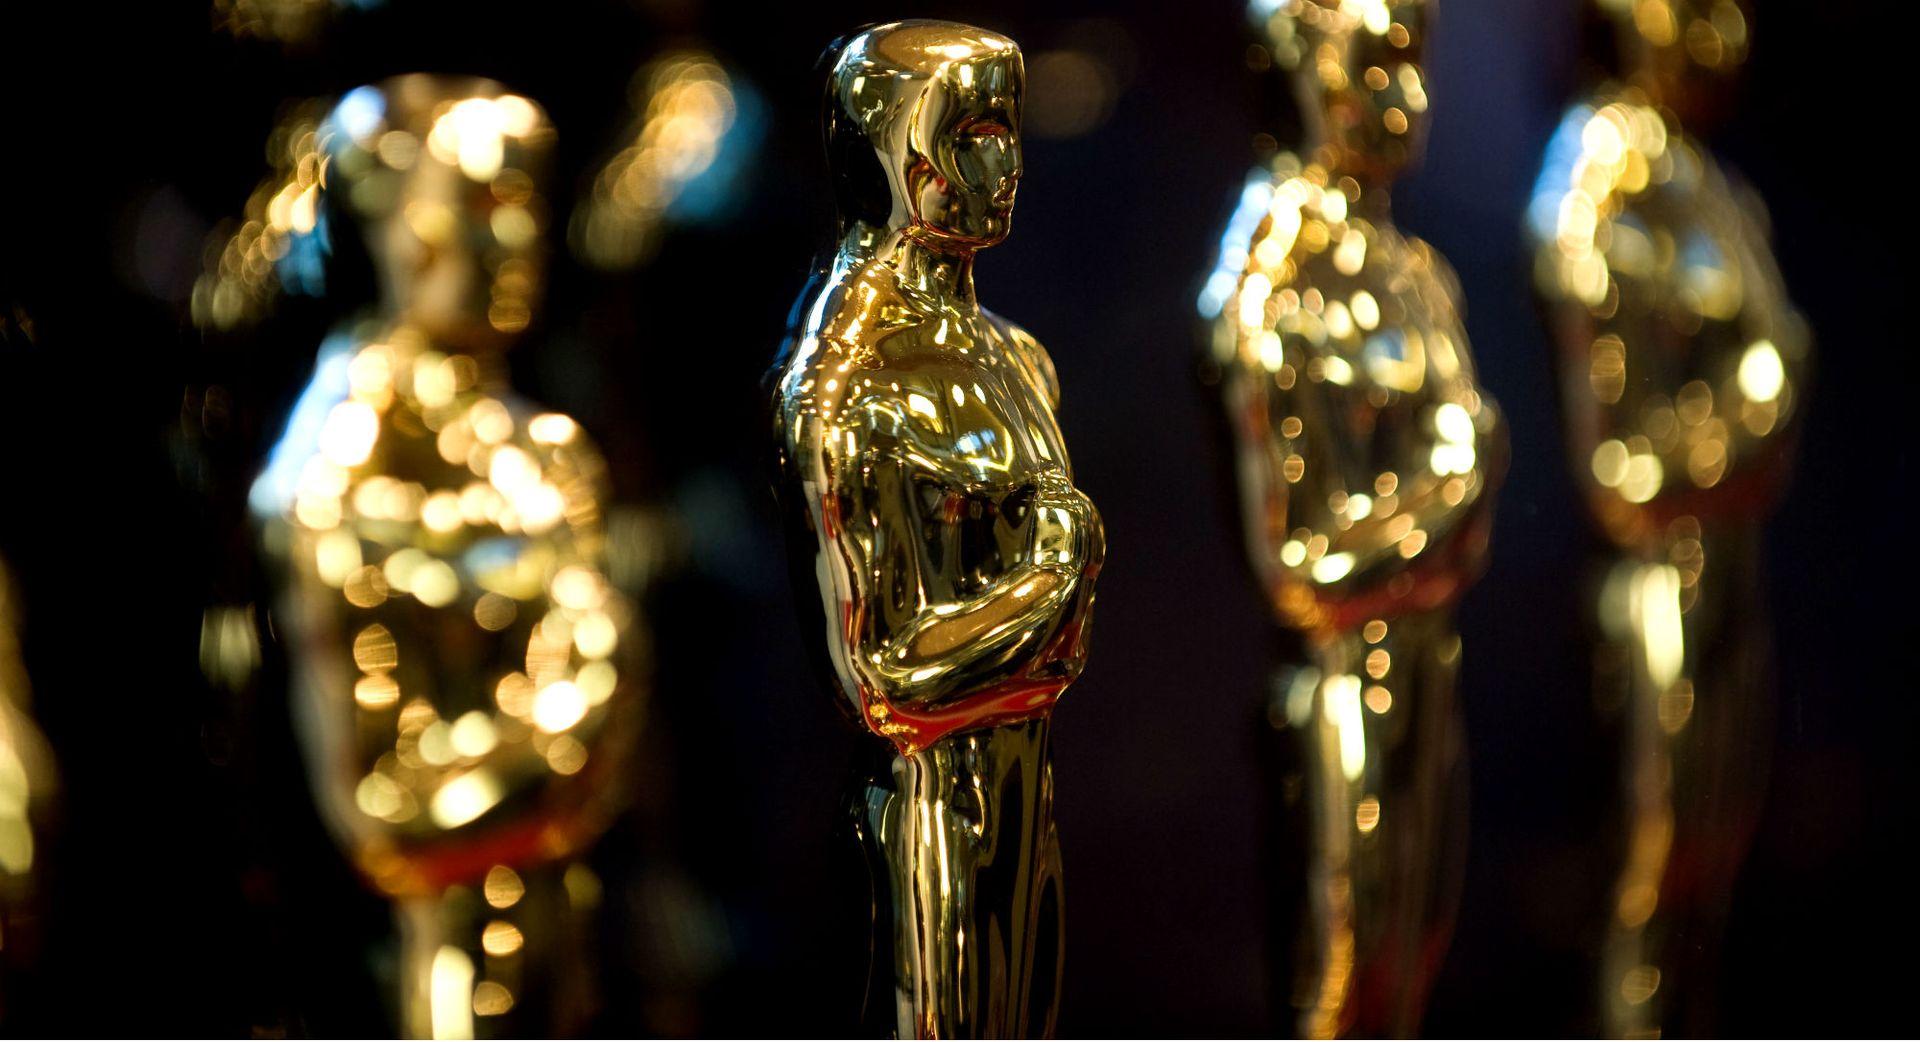 Predstavleno ukraїnśkyh pretendentiv na premiju Oskar-2019